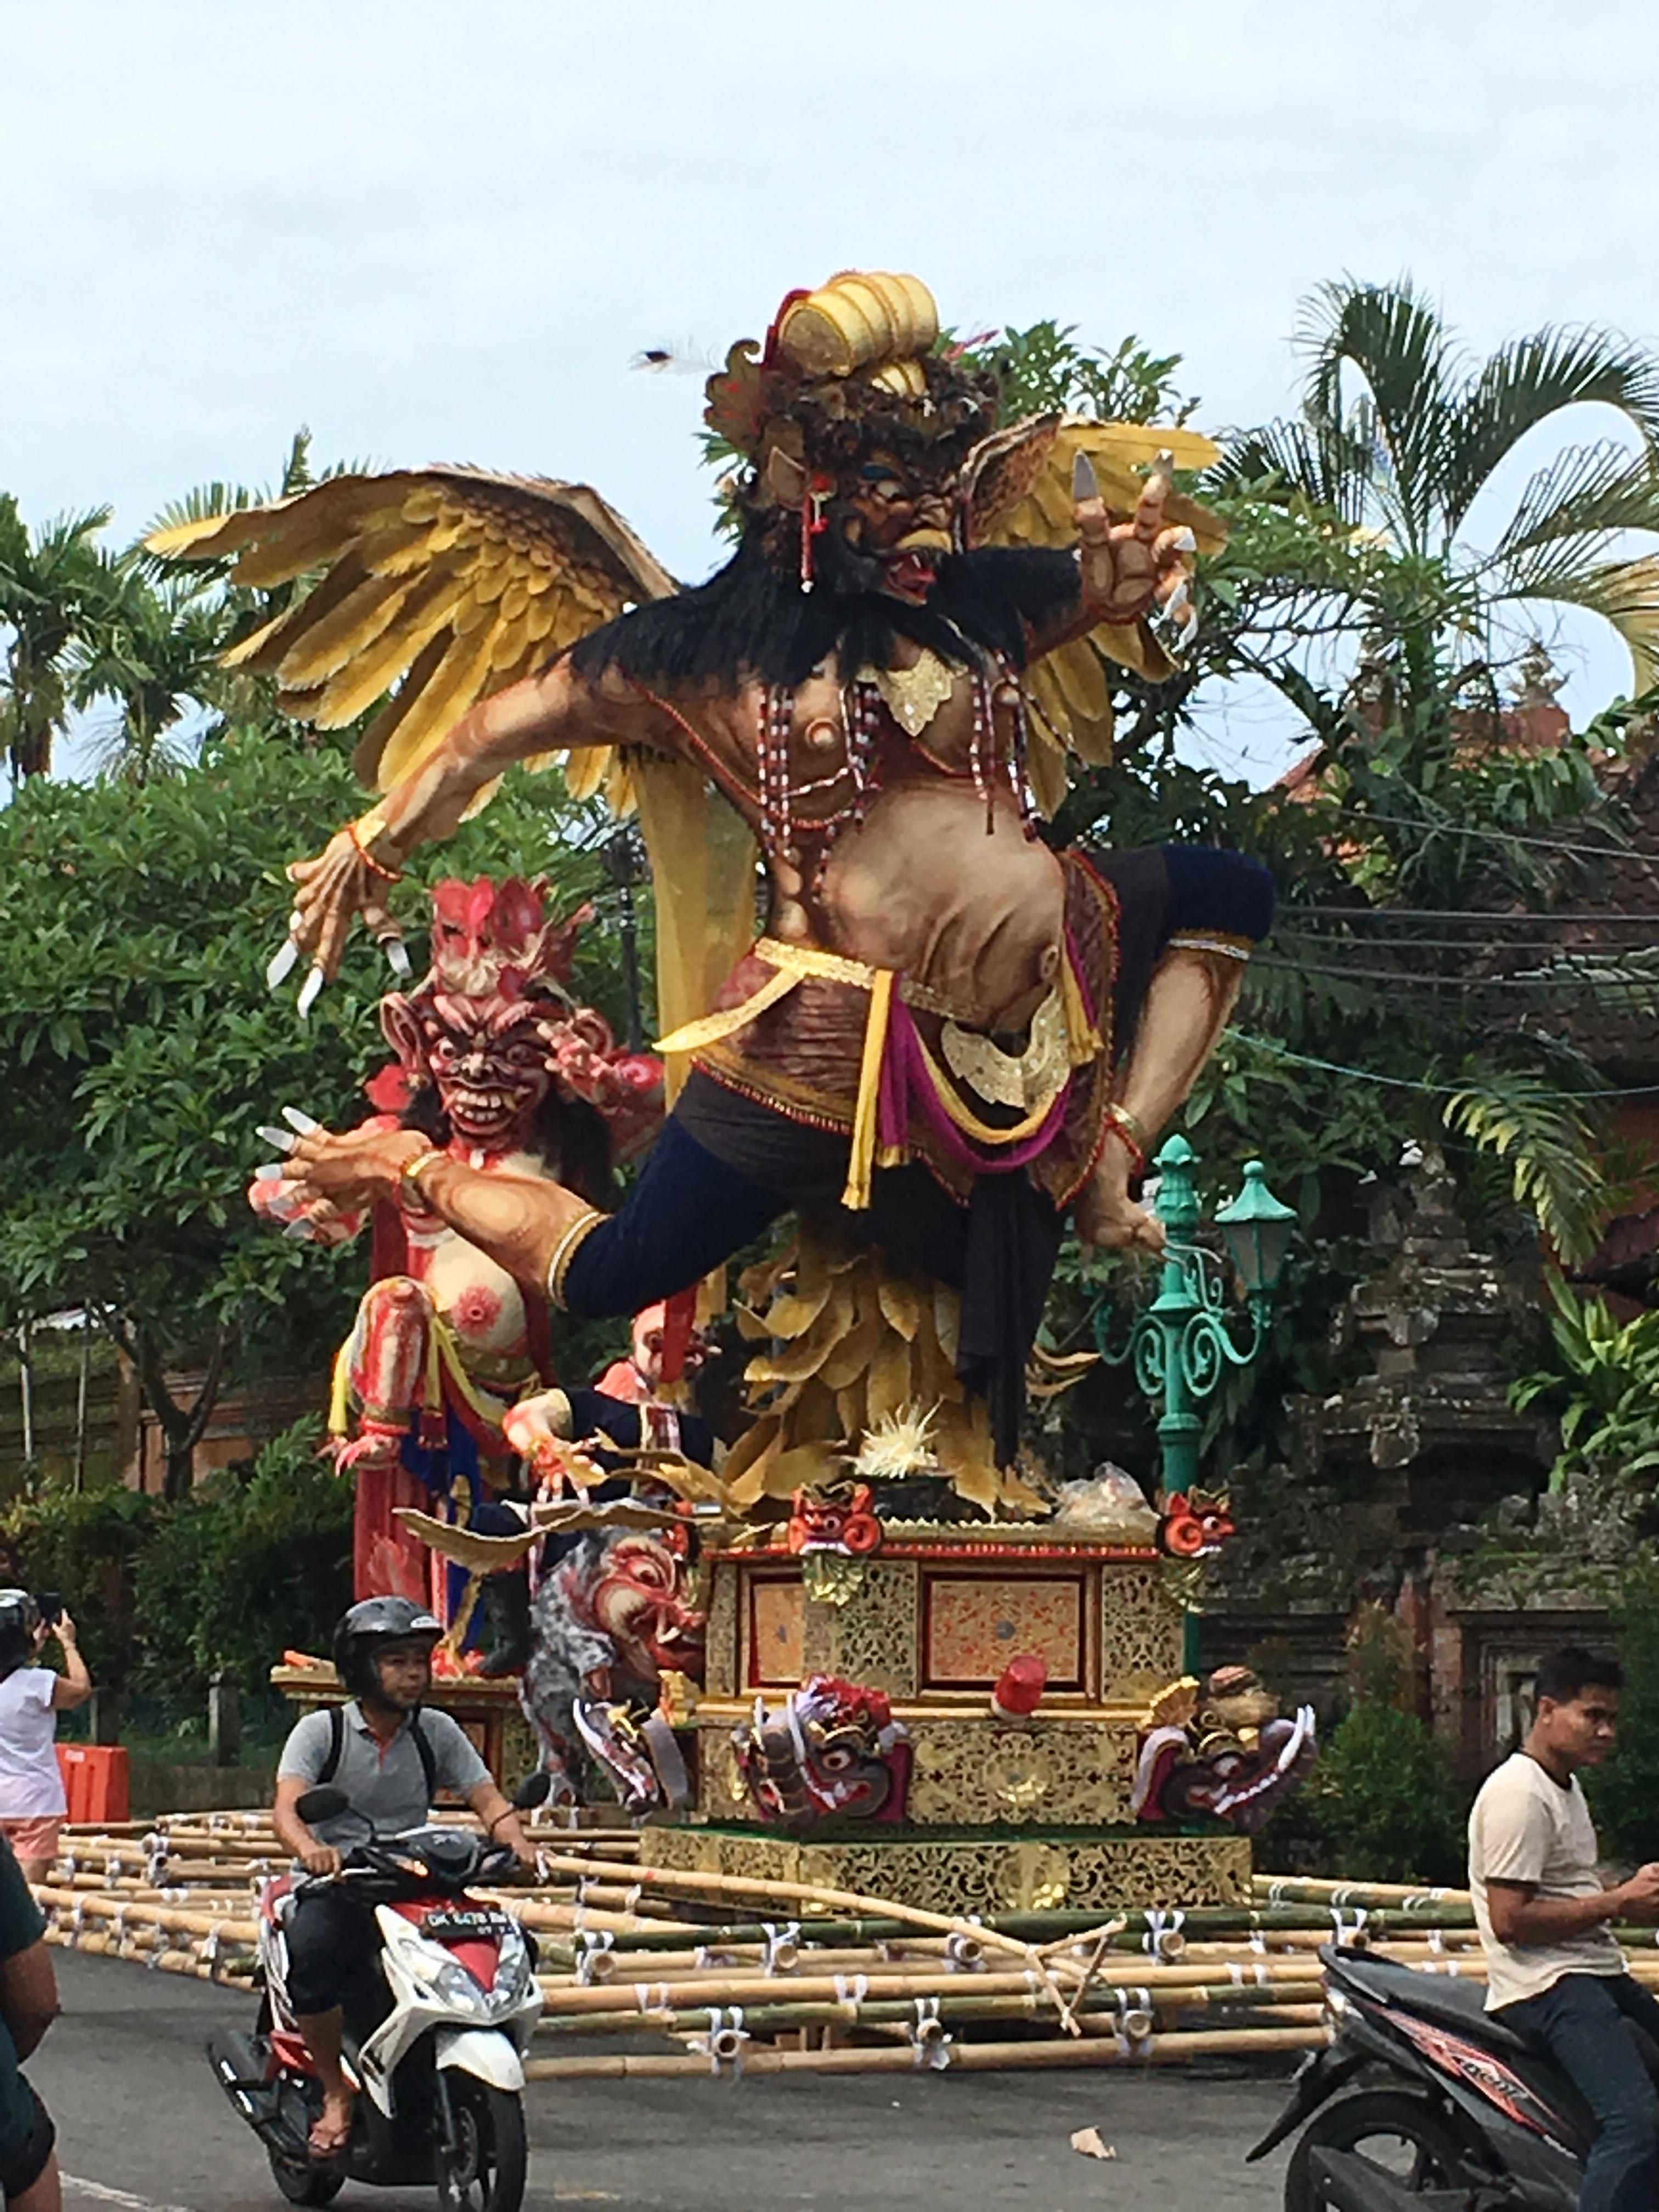 2017-03-27 Bali Ubud Ogoh Ogoh 10.jpg